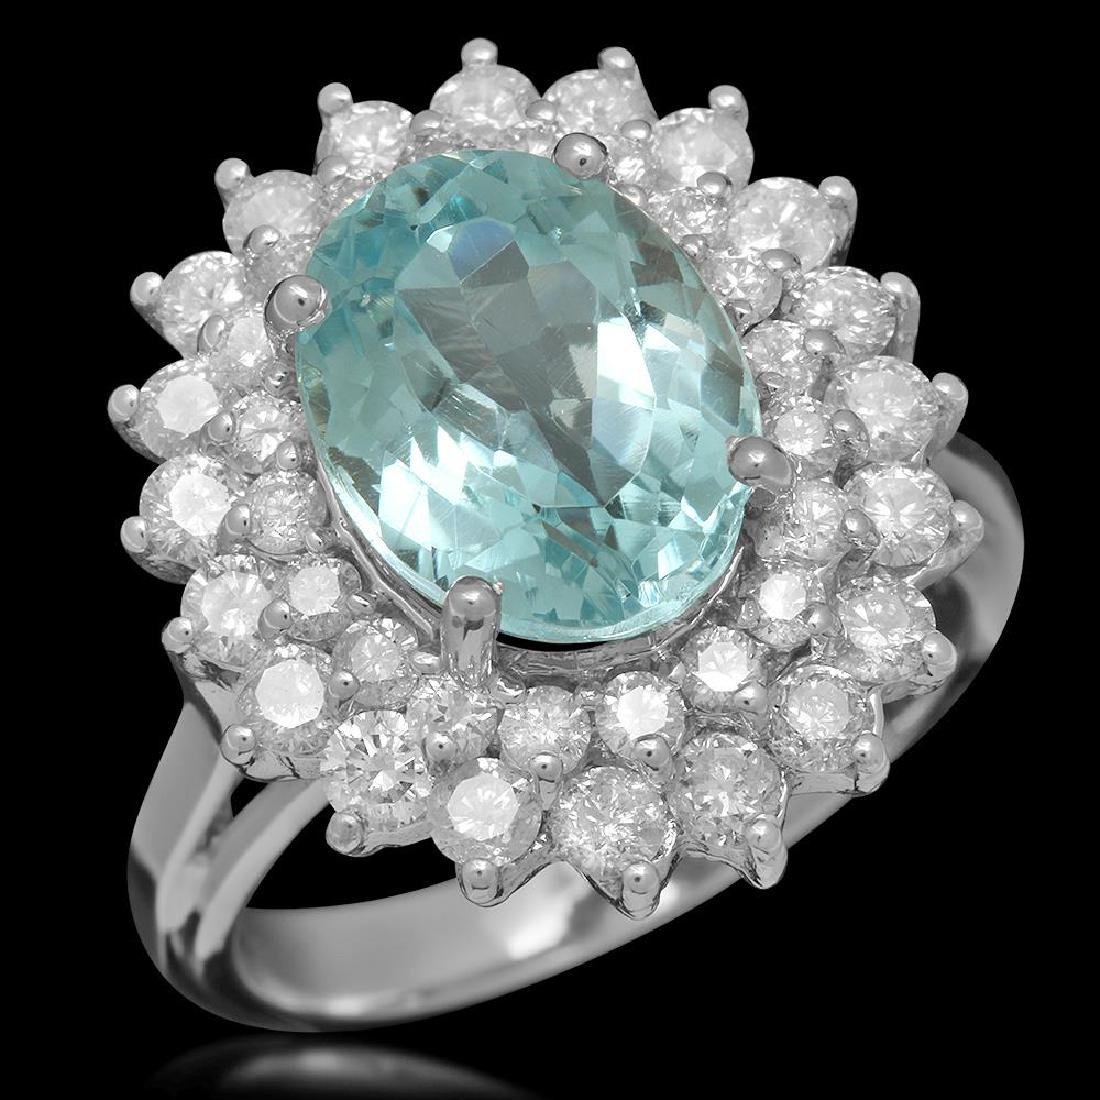 14K Gold 5.04ct Aquamarine 1.62ct Diamond Ring